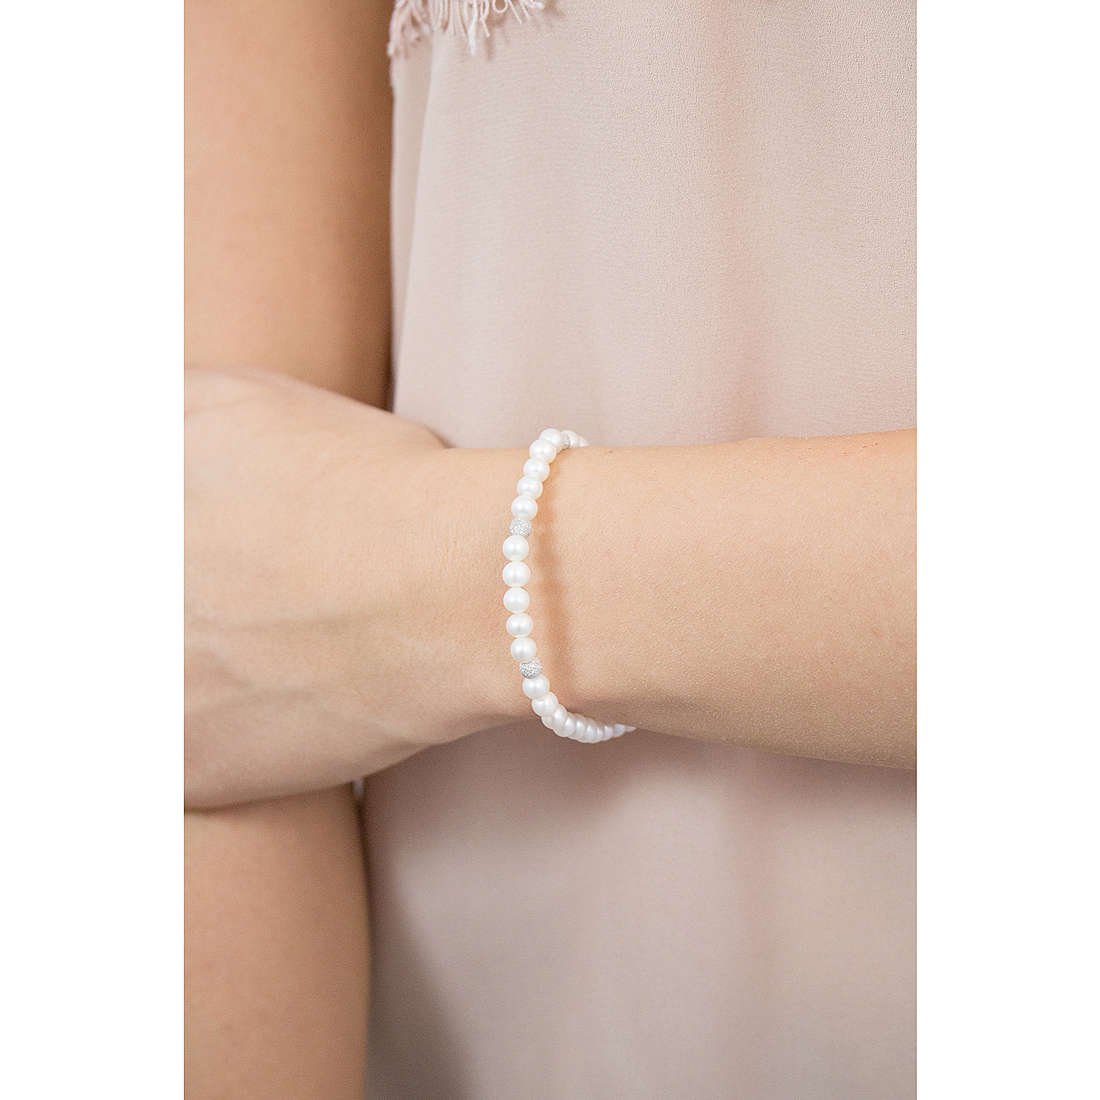 Comete bracelets Fili Fantasia femme BRQ 193 B photo wearing